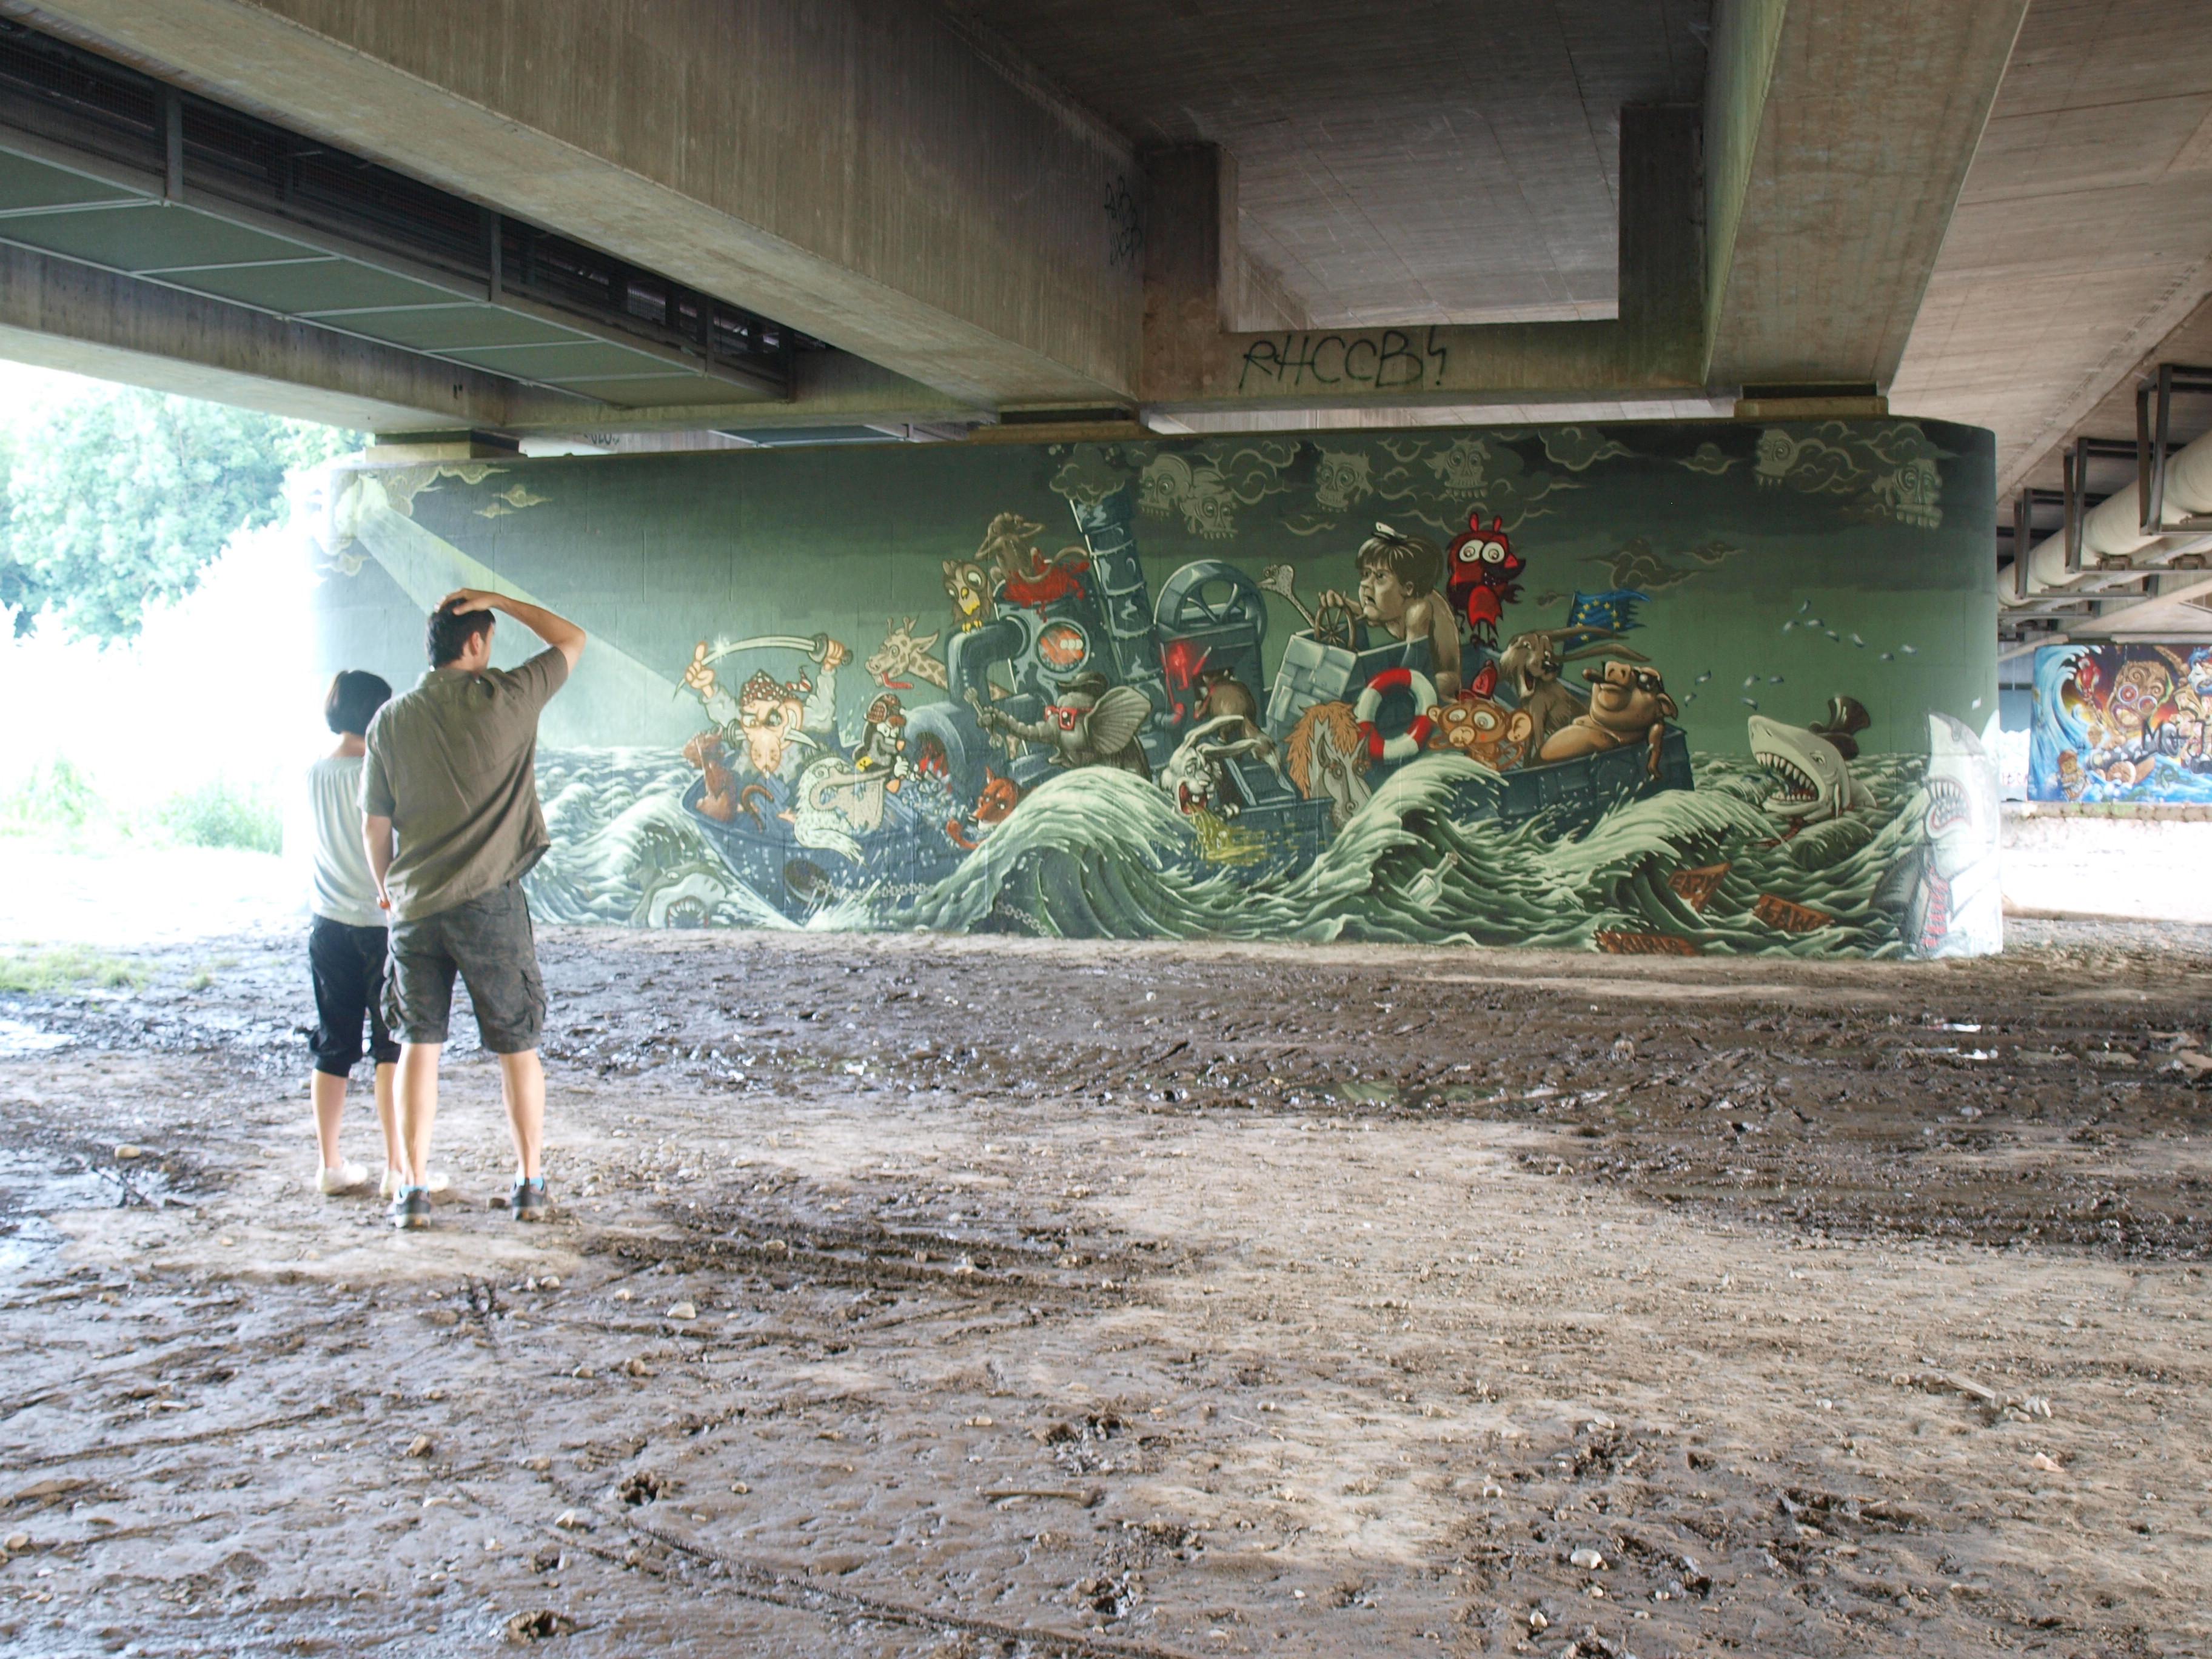 Graffito unter der Brudermühl-Brücke